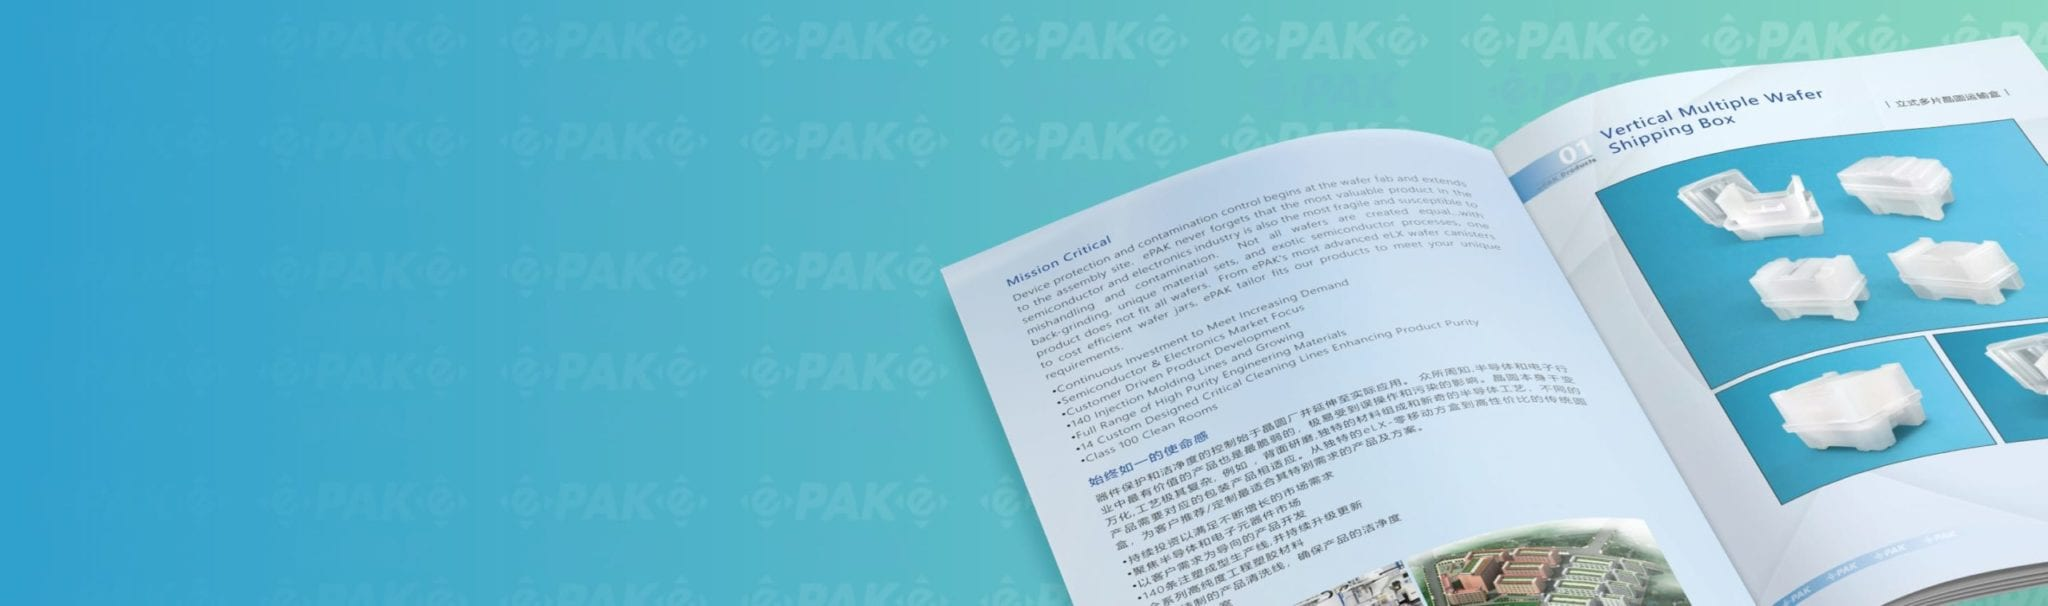 ePAK WordPress Catalog Page